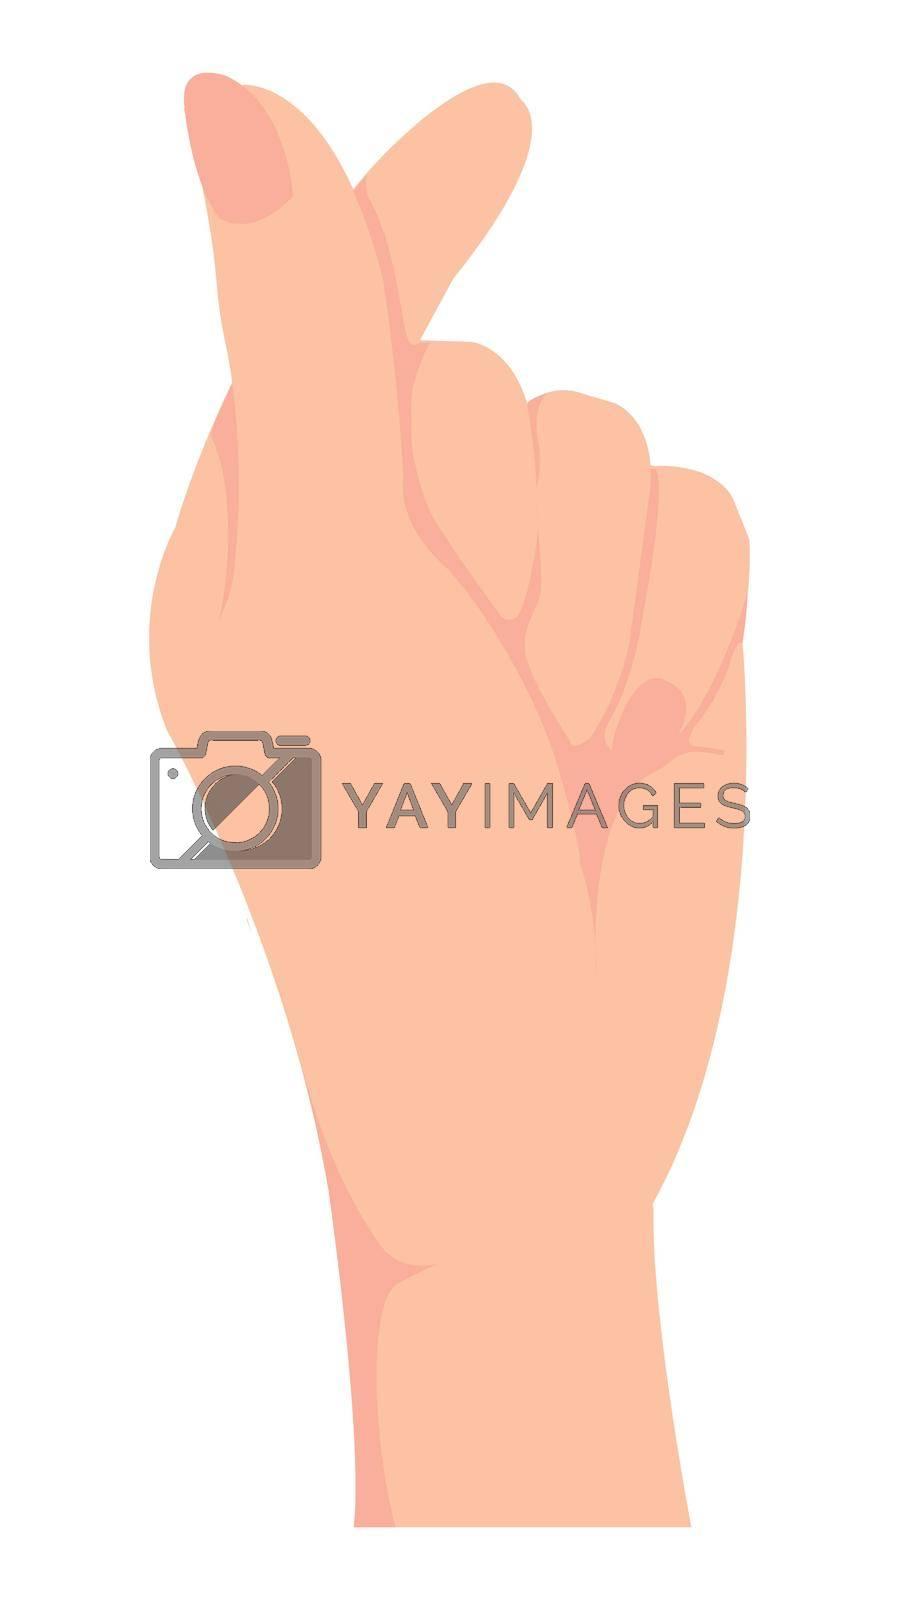 Female hand gesture (hand sign) vector illustration